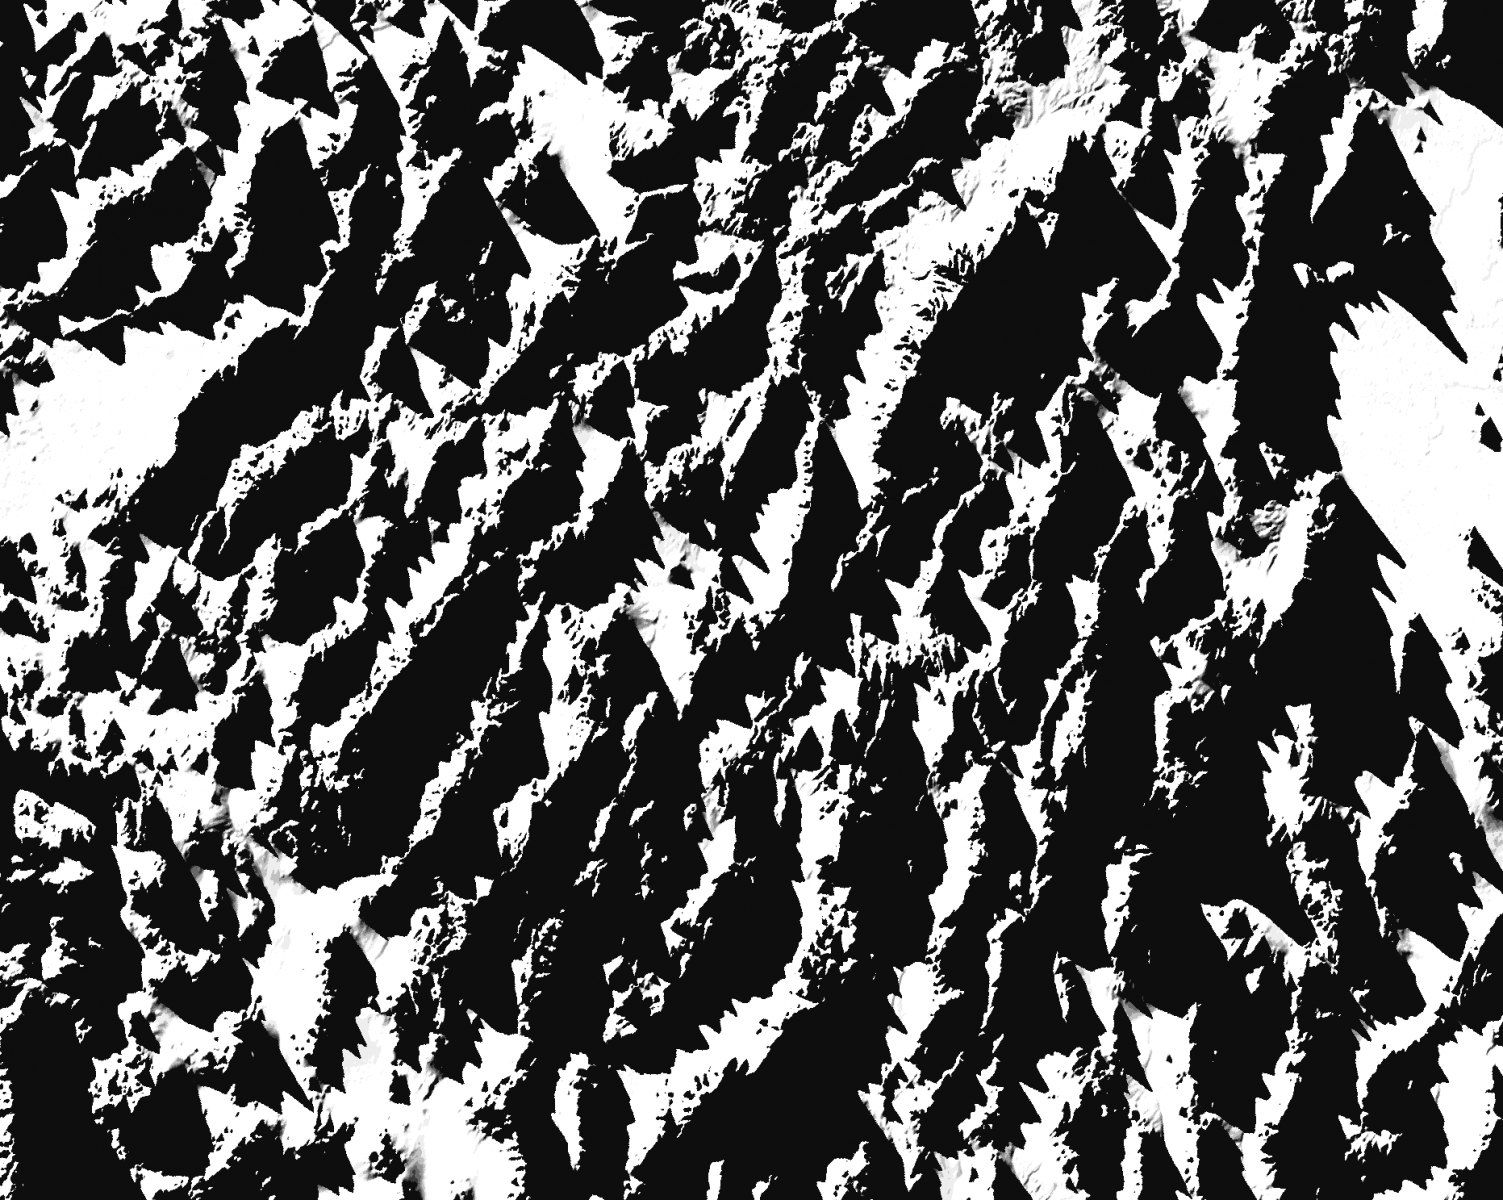 carte-usa-couchers-soleil-08